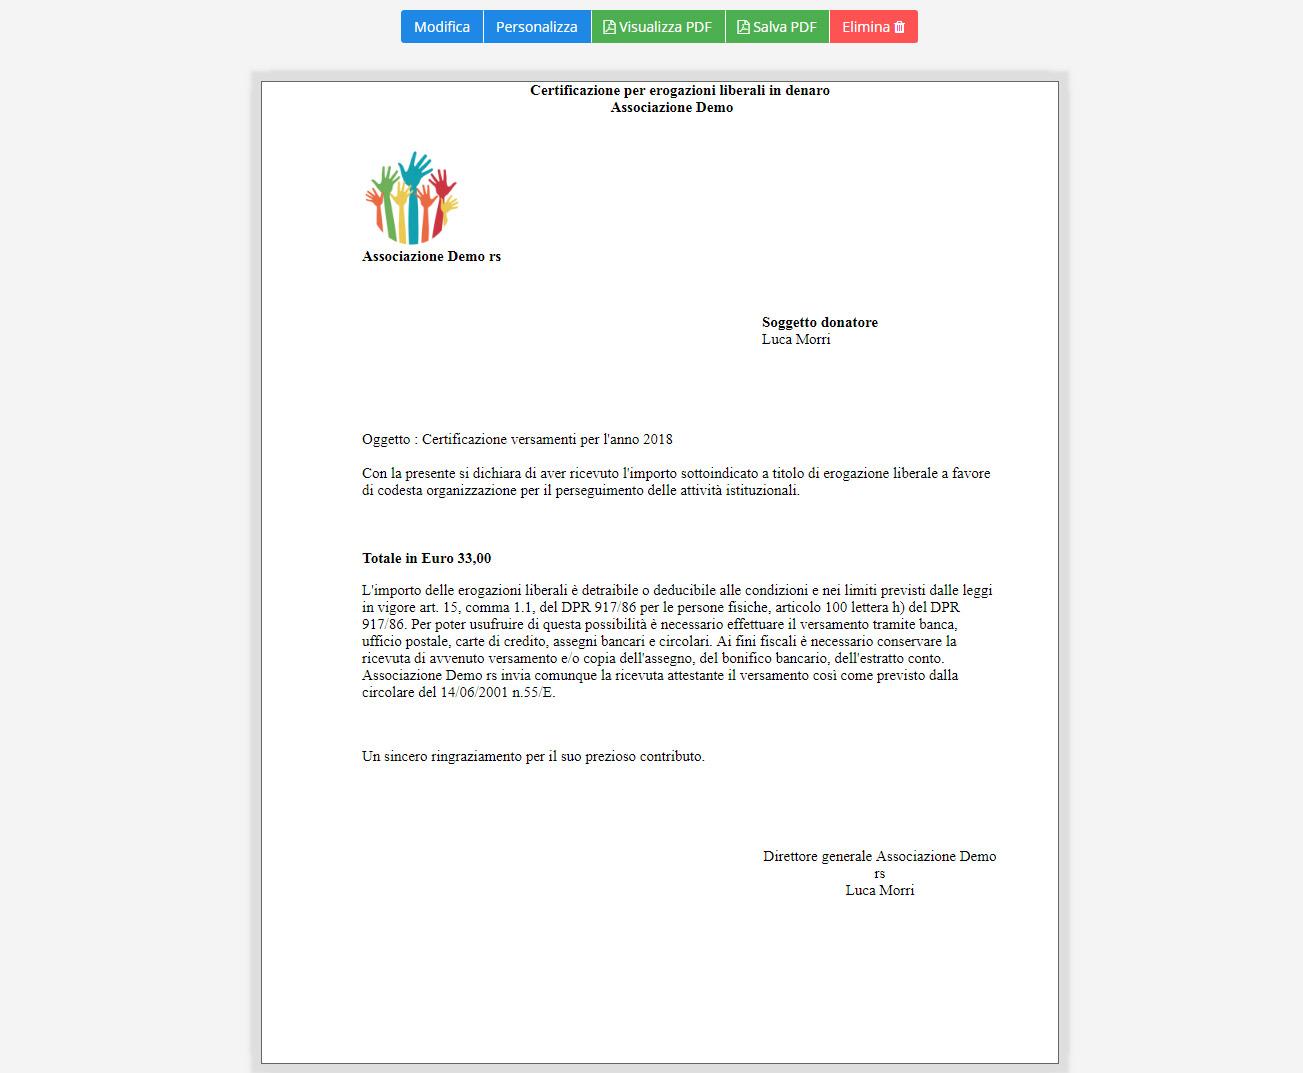 Associazione - Dettaglio certificazioni